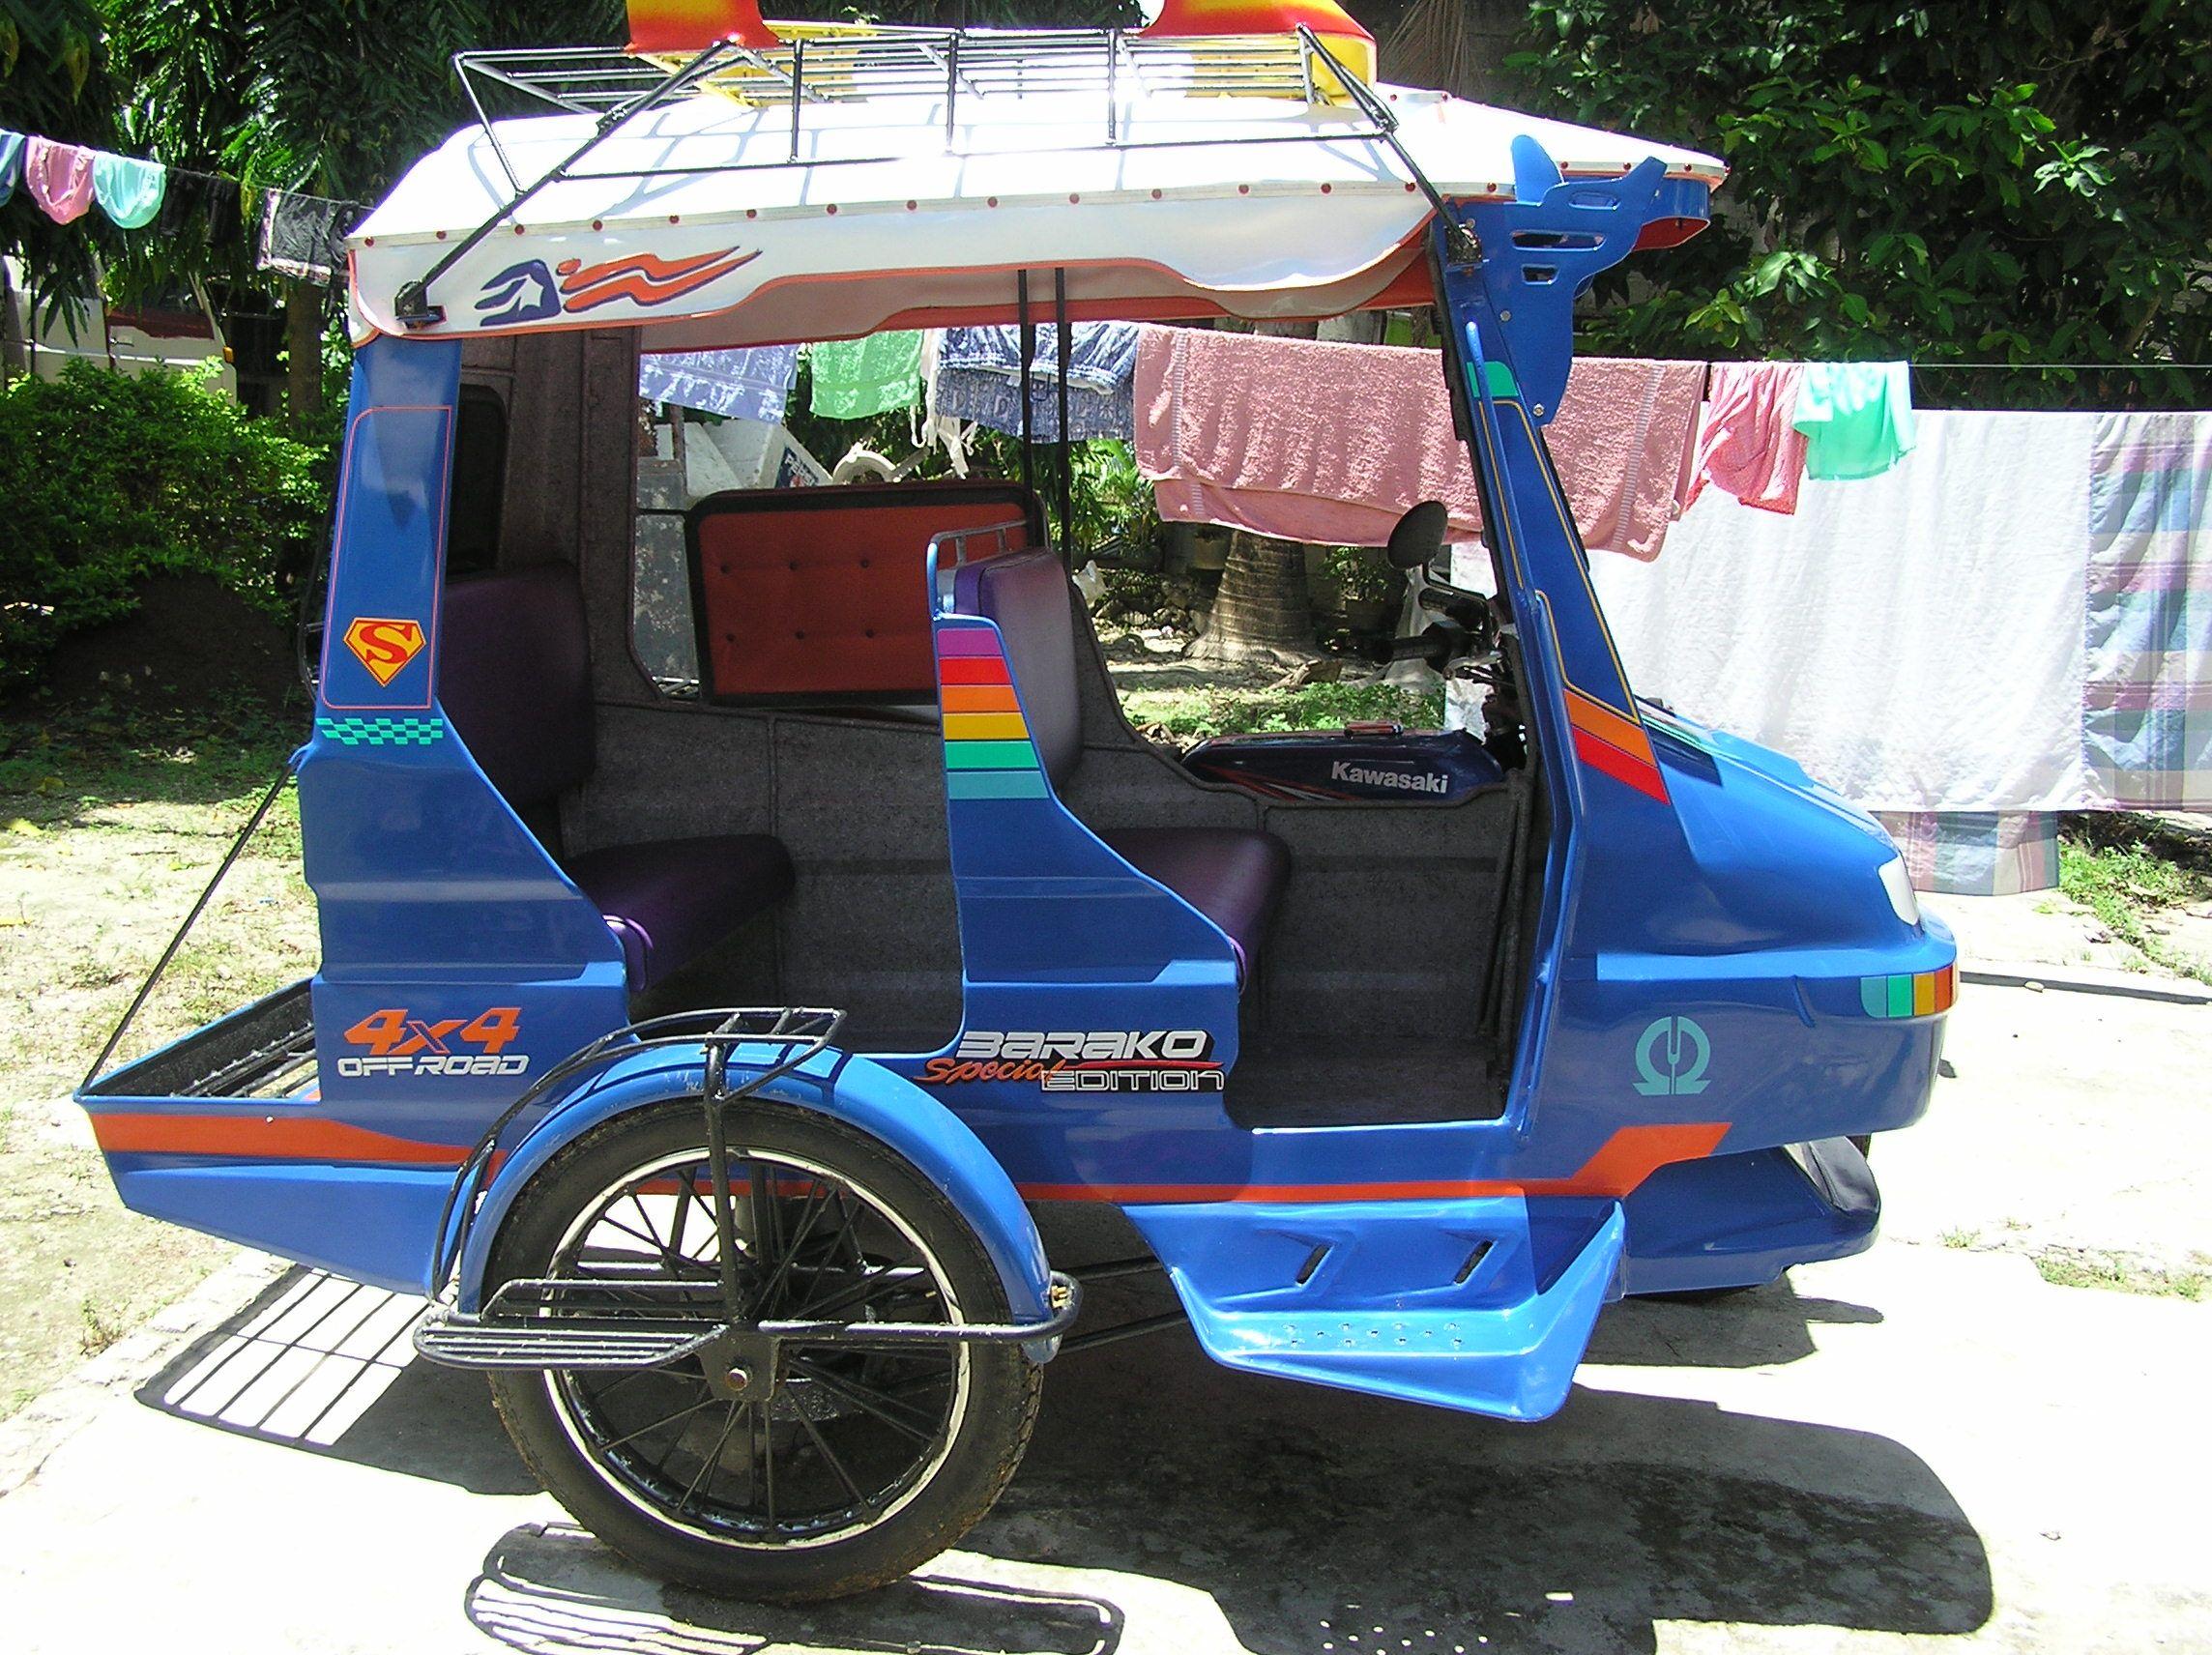 Sidecar Maker Philippines Pin - Exploring Mars